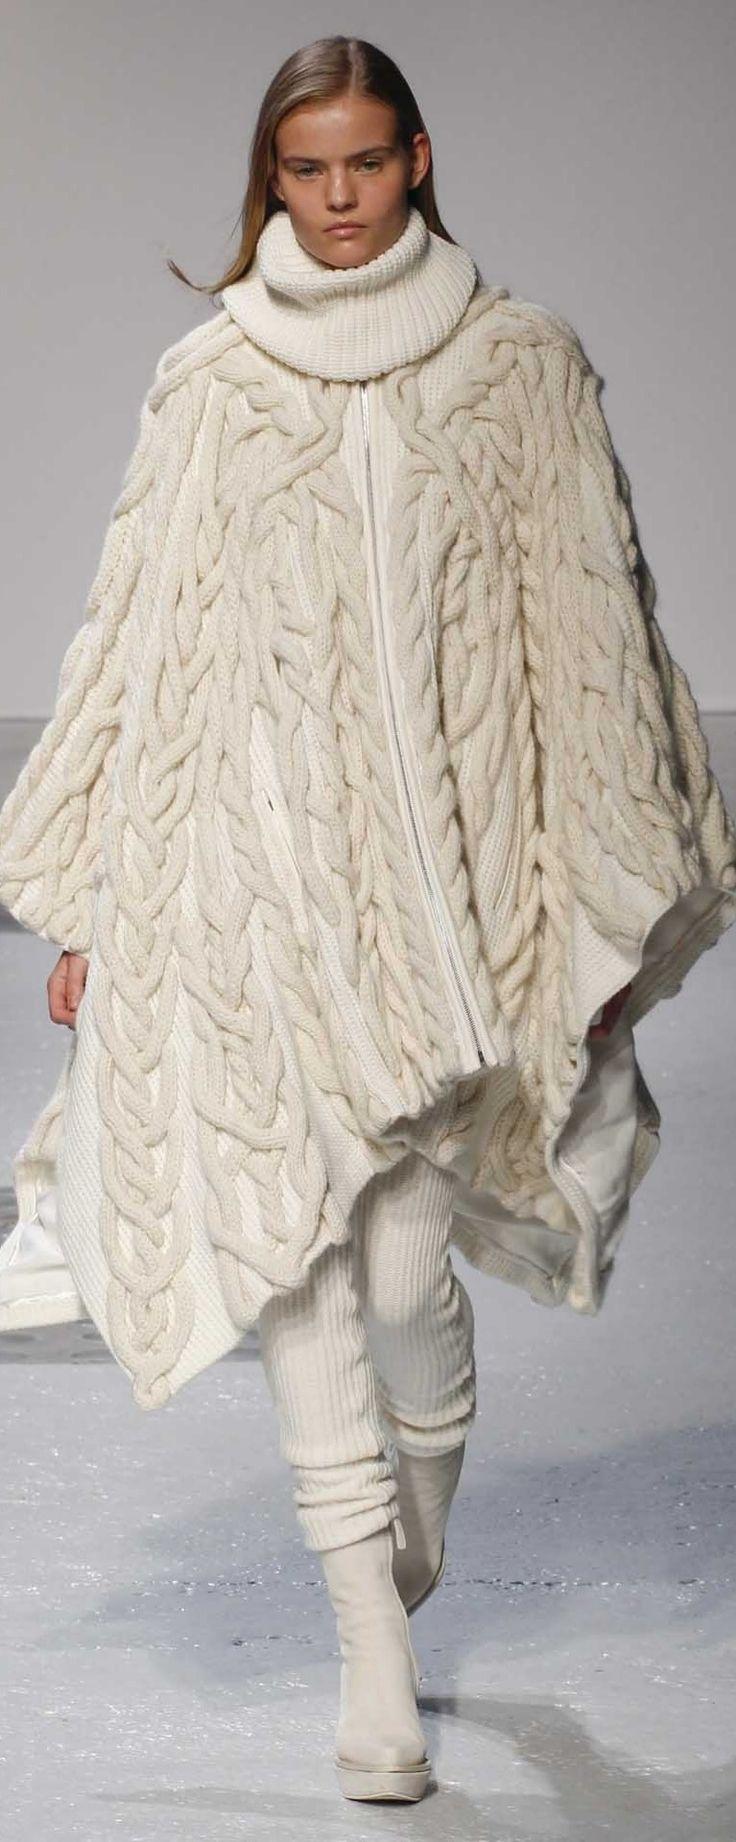 Barbara Bui ready-to-wear autumn/winter'14/'15, Source: Australian Vogue online